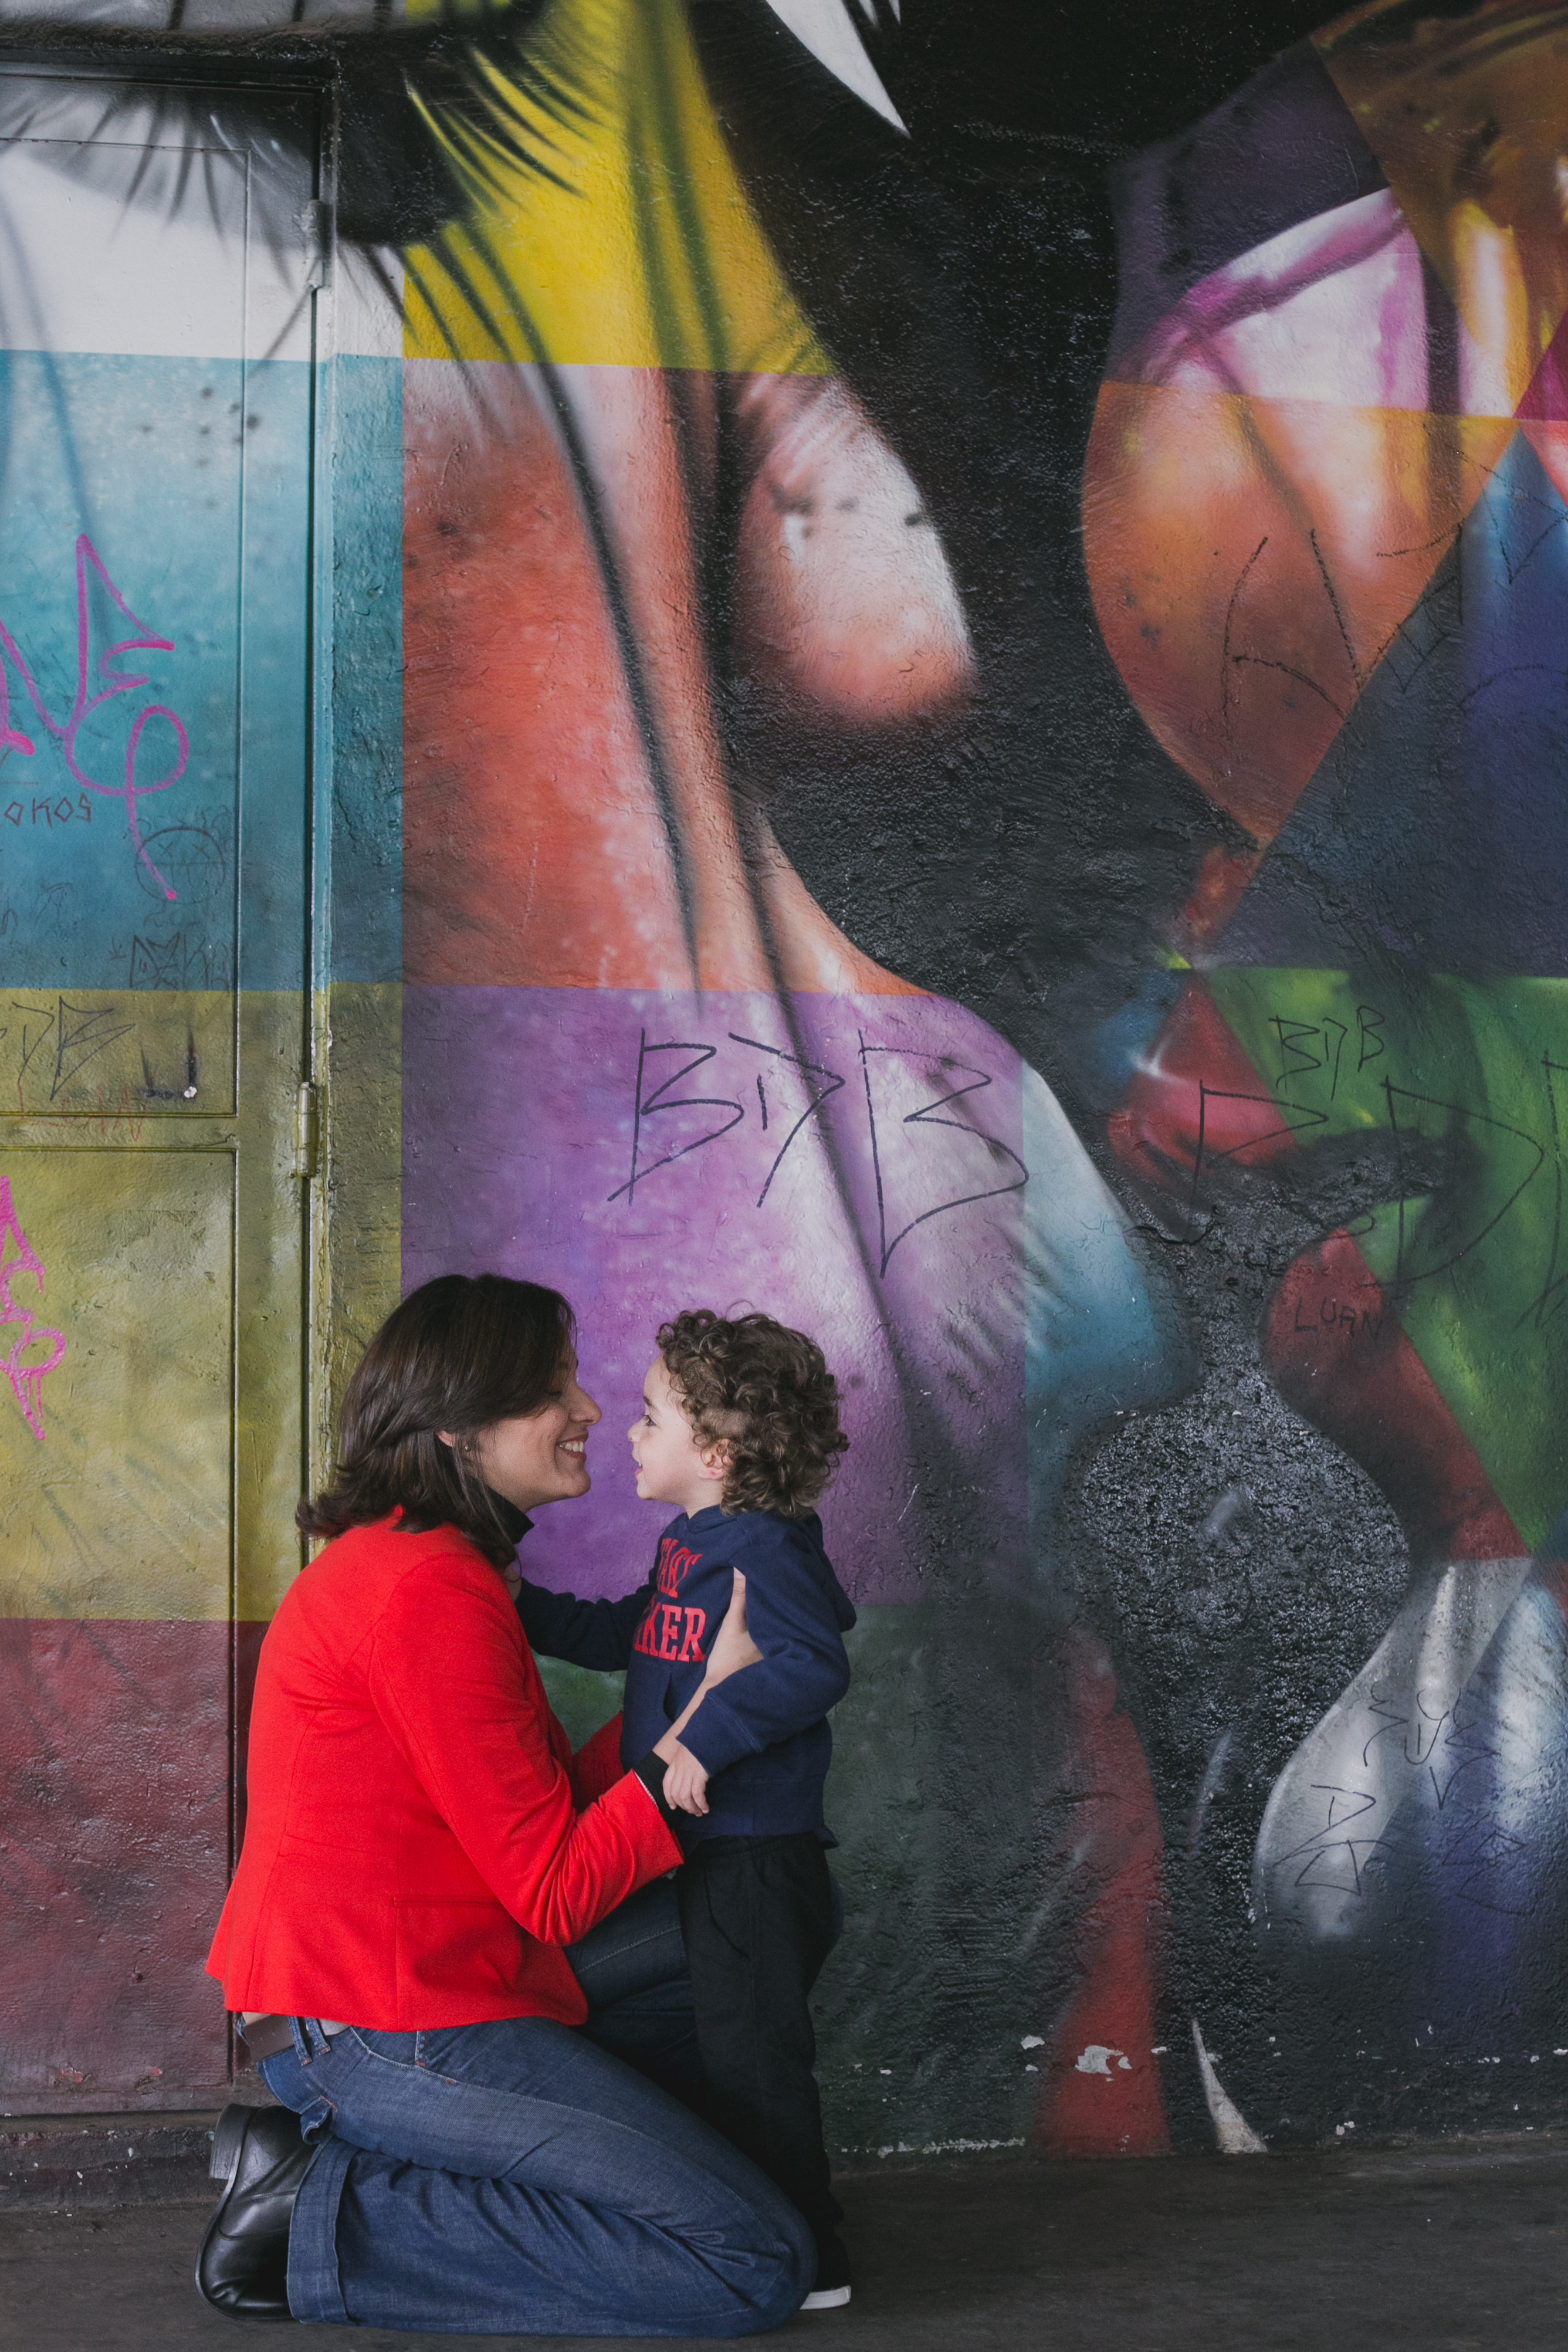 Sobre Fotógrafa de Gestante e Familia SP | Tati Monteiro - fotografia de gestante sp, fotografia de família sp, fotografia gravida, fotos gestante, fotos gravida, fotografo aniversario sp, fotos bebe sp, fotografia de parto sp, fotografa de parto